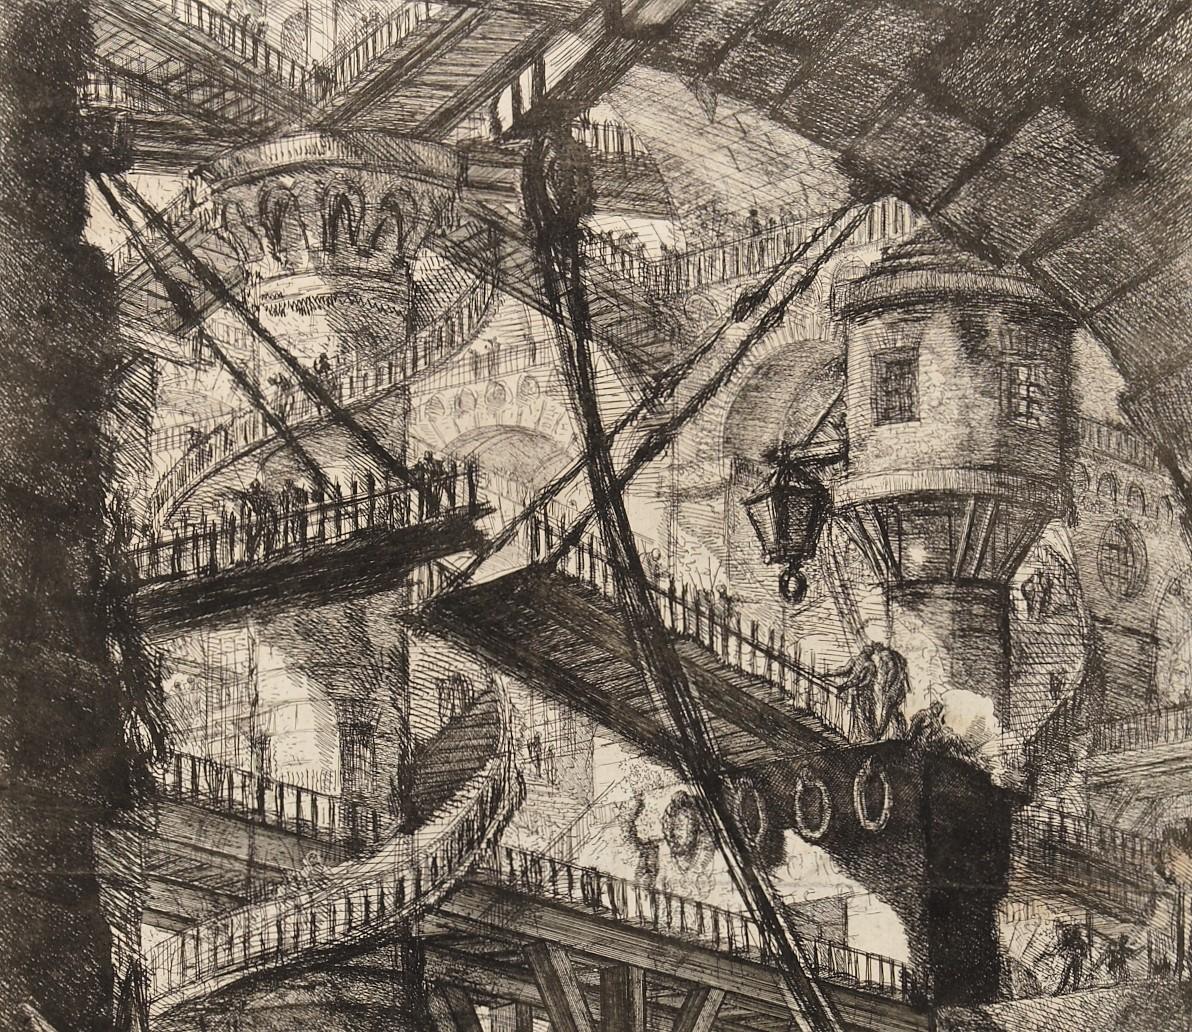 Detail from 'The Drawbridge', etching by Giovanni Battista Piranesi c1761